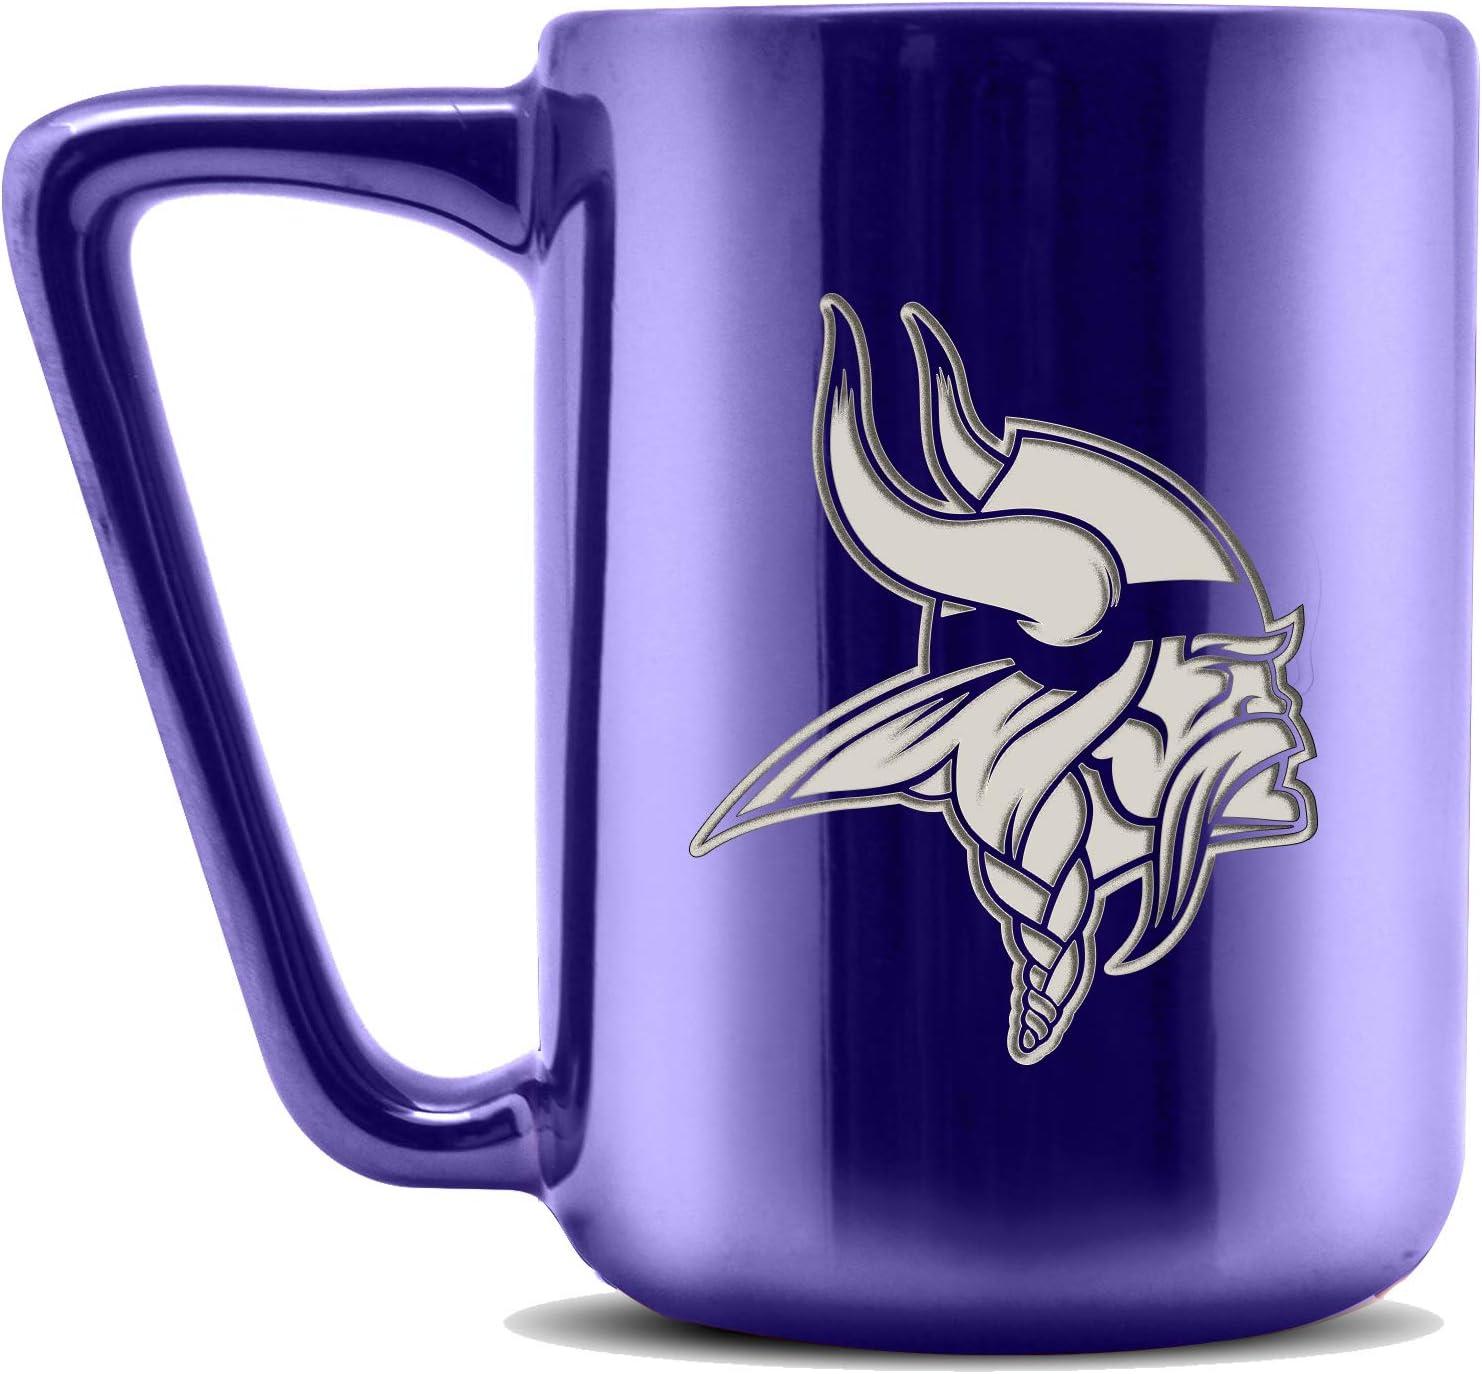 Duck House NFL Minnesota Vikings Ceramic Laser Engraved Coffee Mug 16oz Metallic Finish